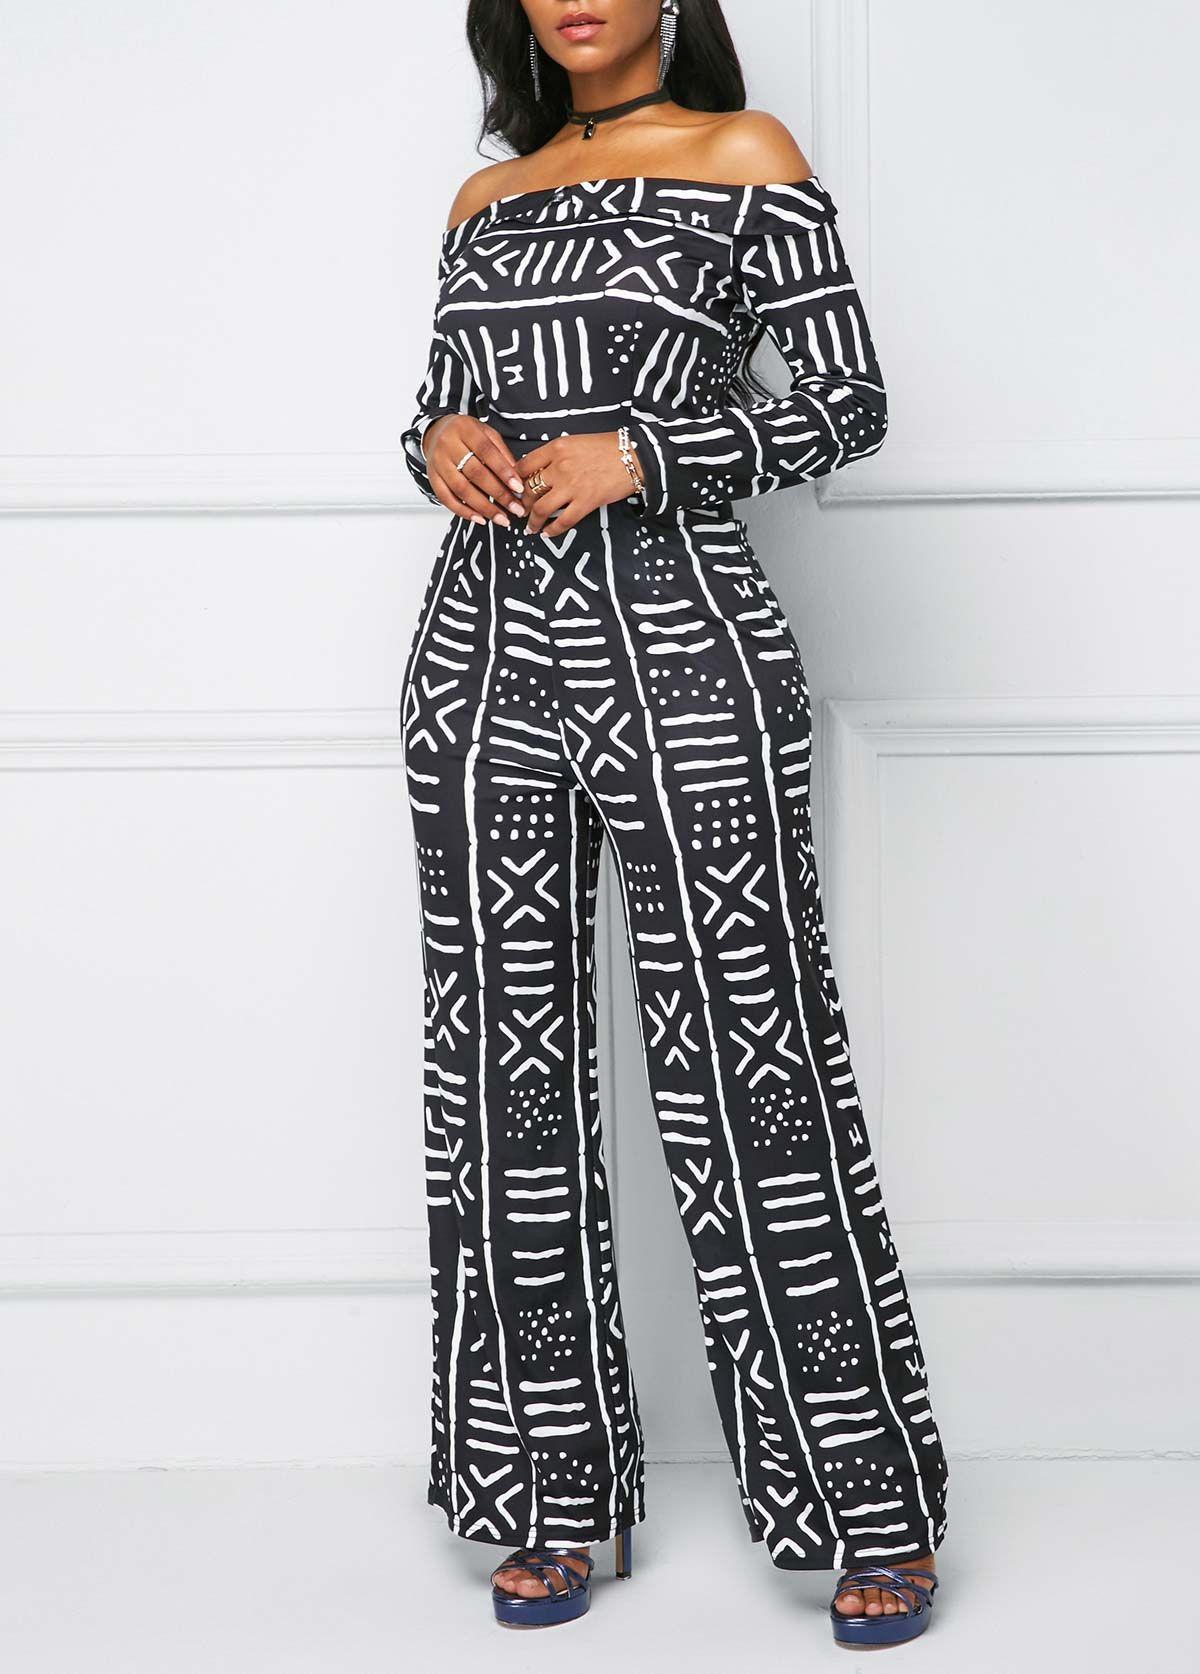 ed84a2f9cbb Printed Off the Shoulder Long Sleeve Jumpsuit | Rotita.com - USD ...